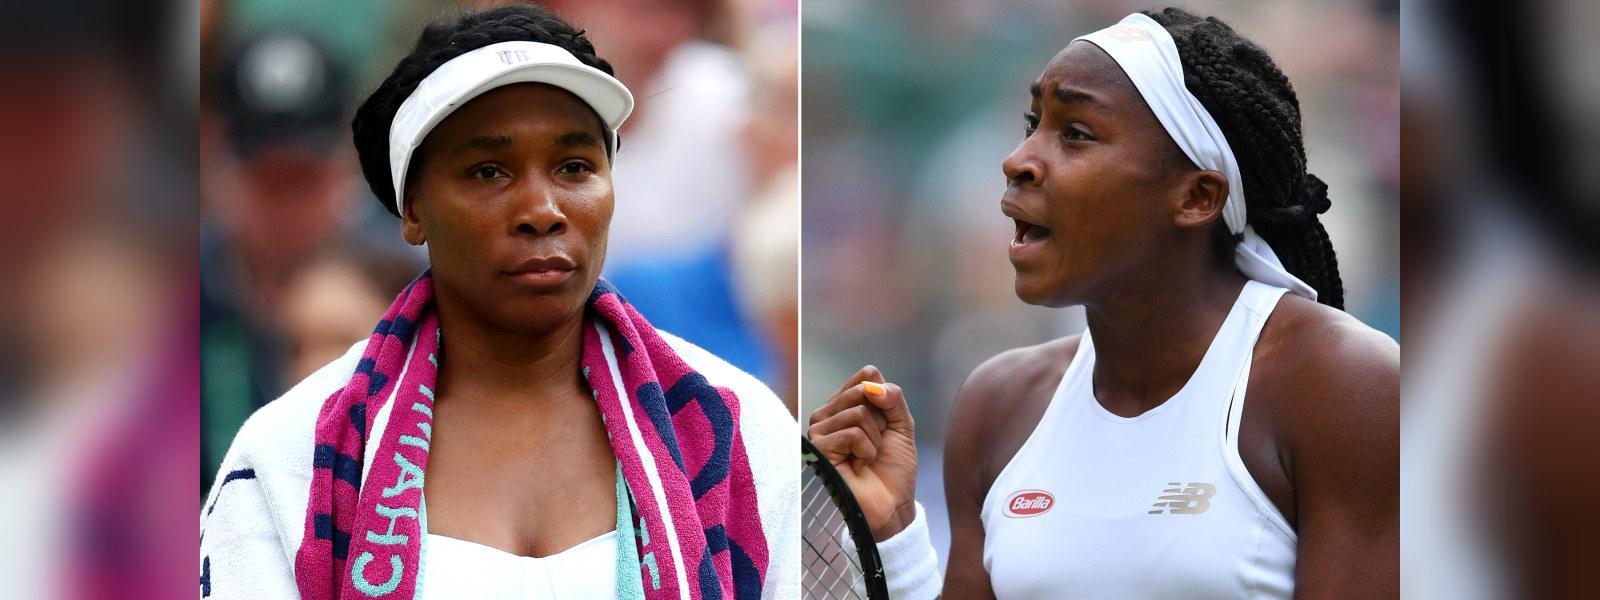 Venus defeat by 15-year old Gauff in Wimbledon